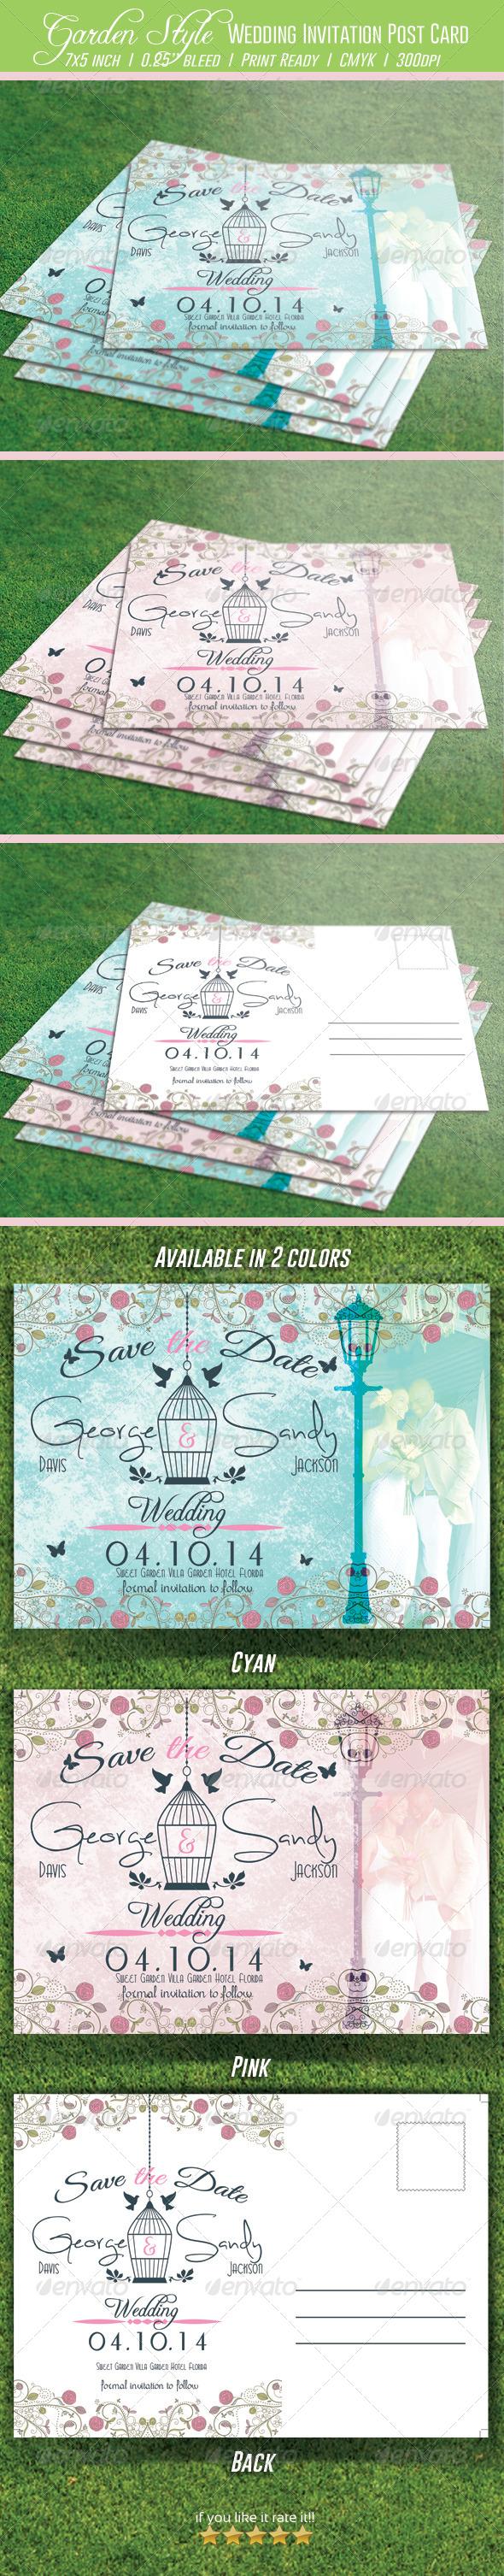 Garden Style Wedding Invitation Post Card - Weddings Cards & Invites